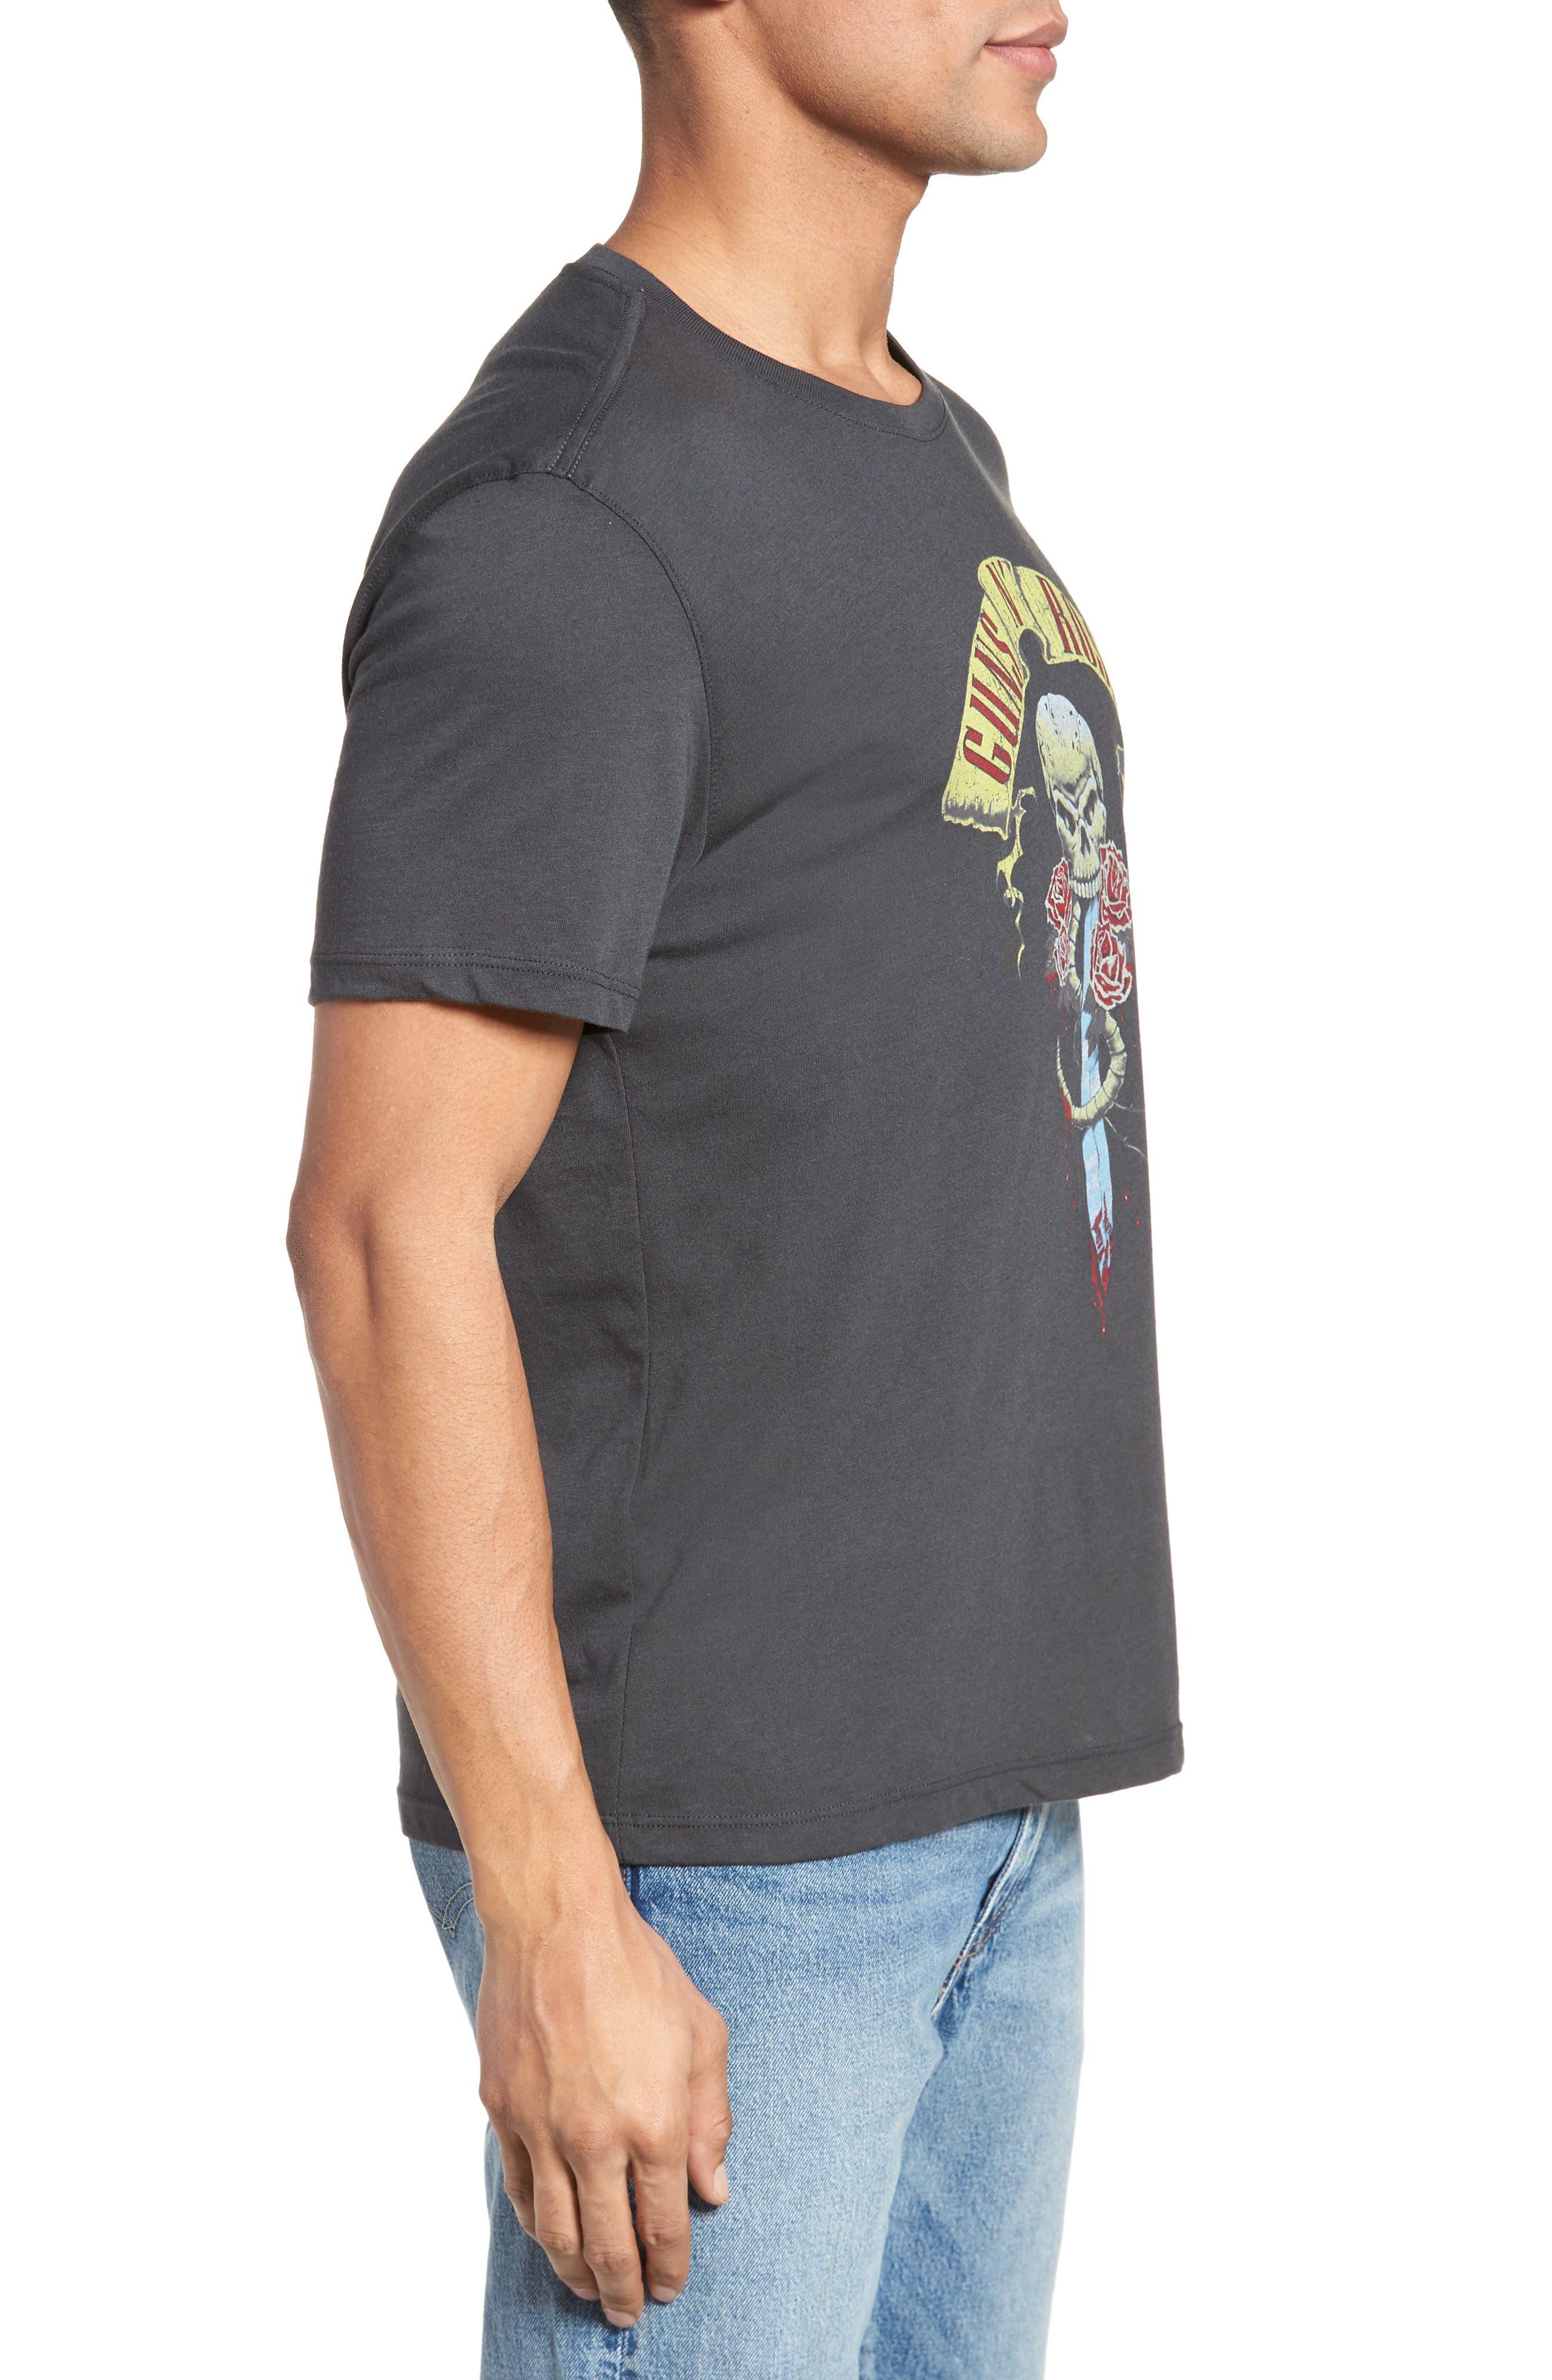 Guns N' Roses Graphic T-Shirt,                             Alternate thumbnail 3, color,                             013